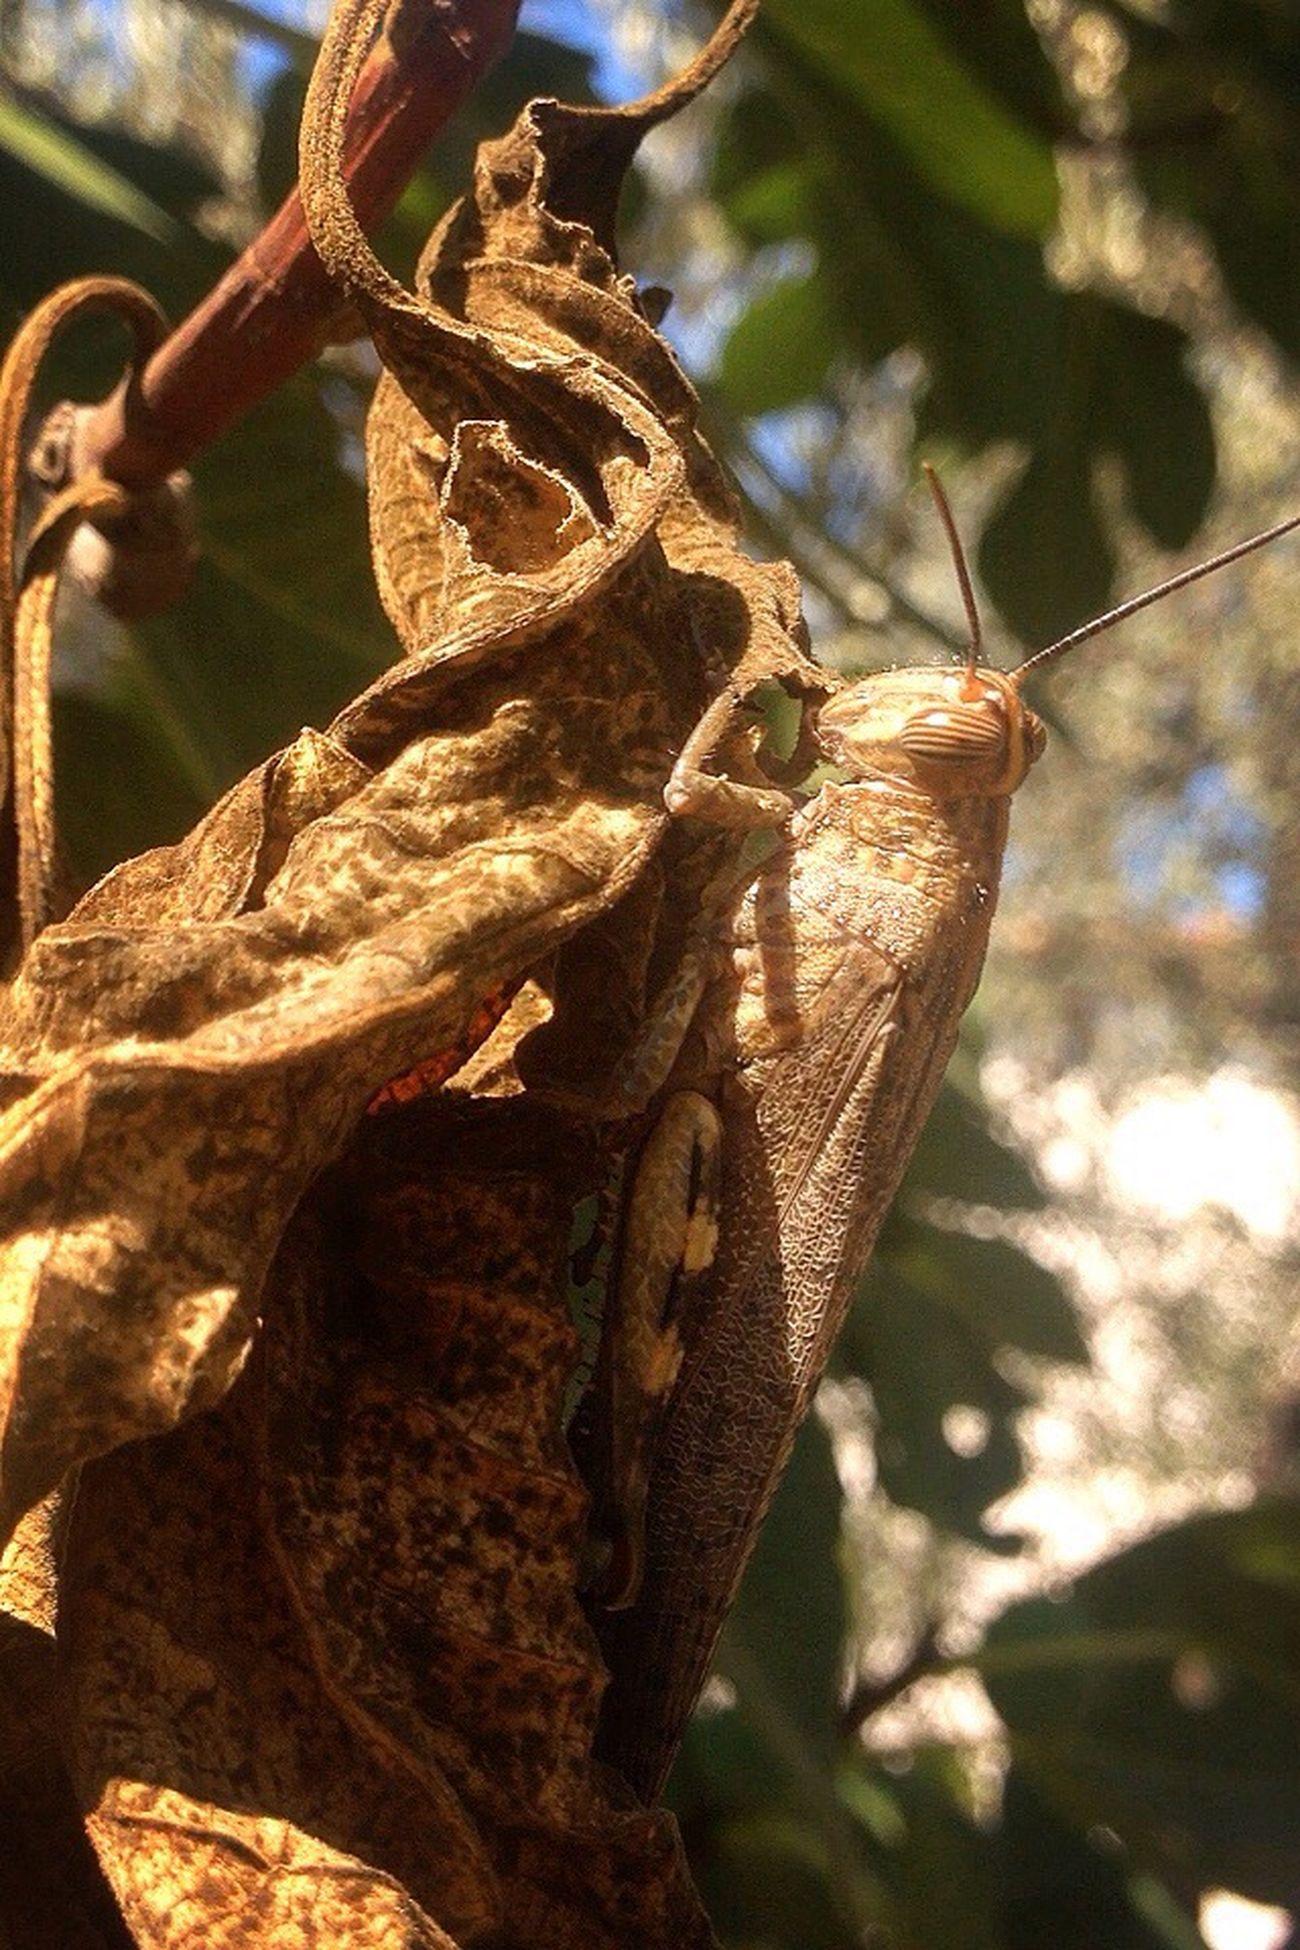 BIG Grasshopper Büyük çekirge Grasshoppers Dry Leaf 🍂🐜